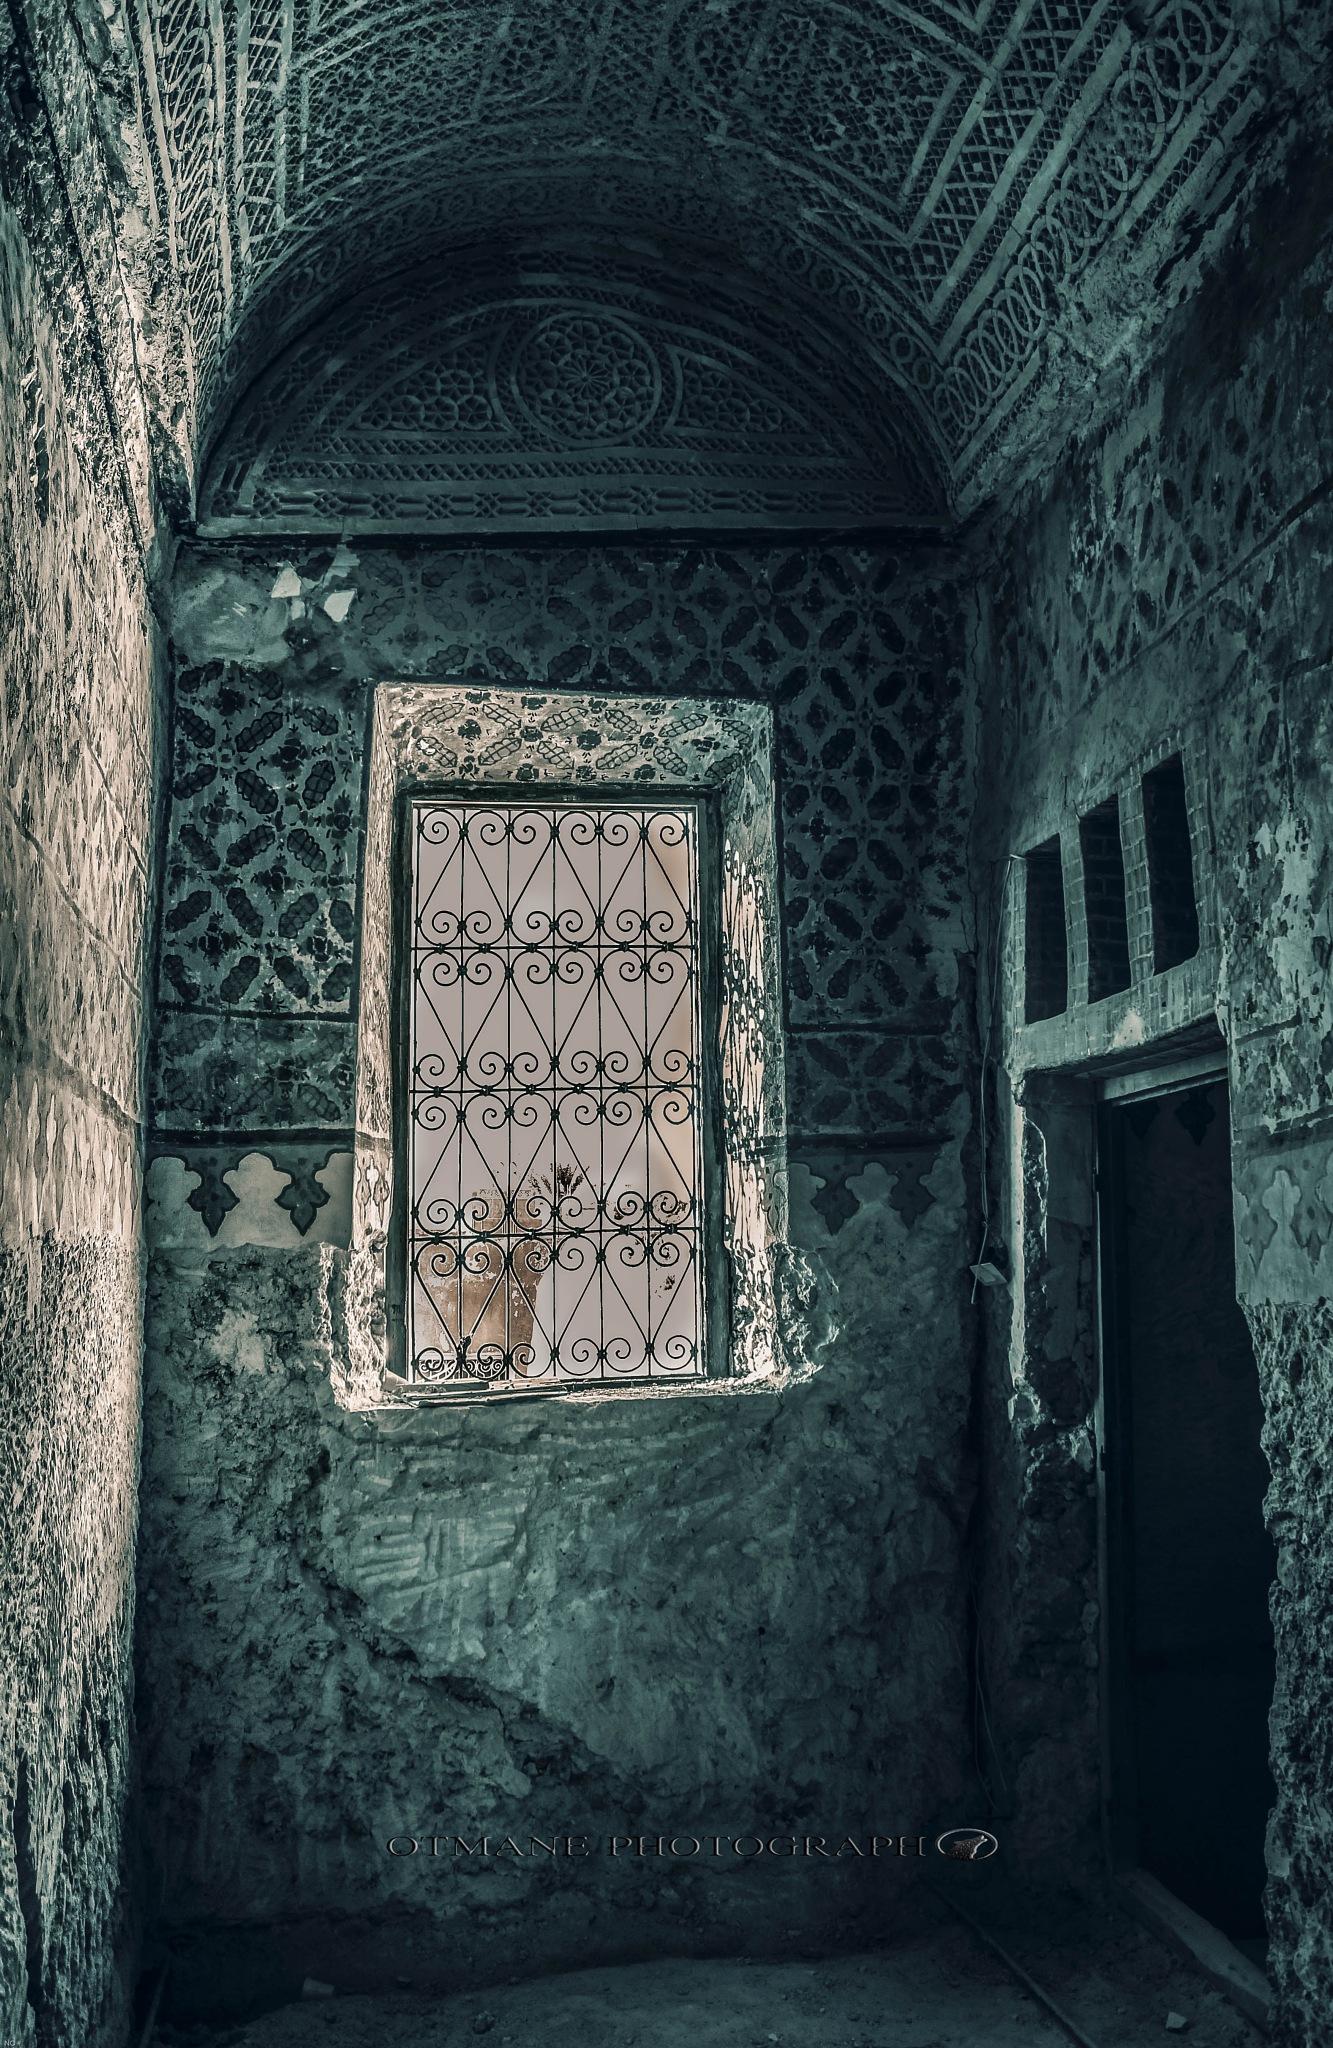 Untitled by Othman Hadjbrahim